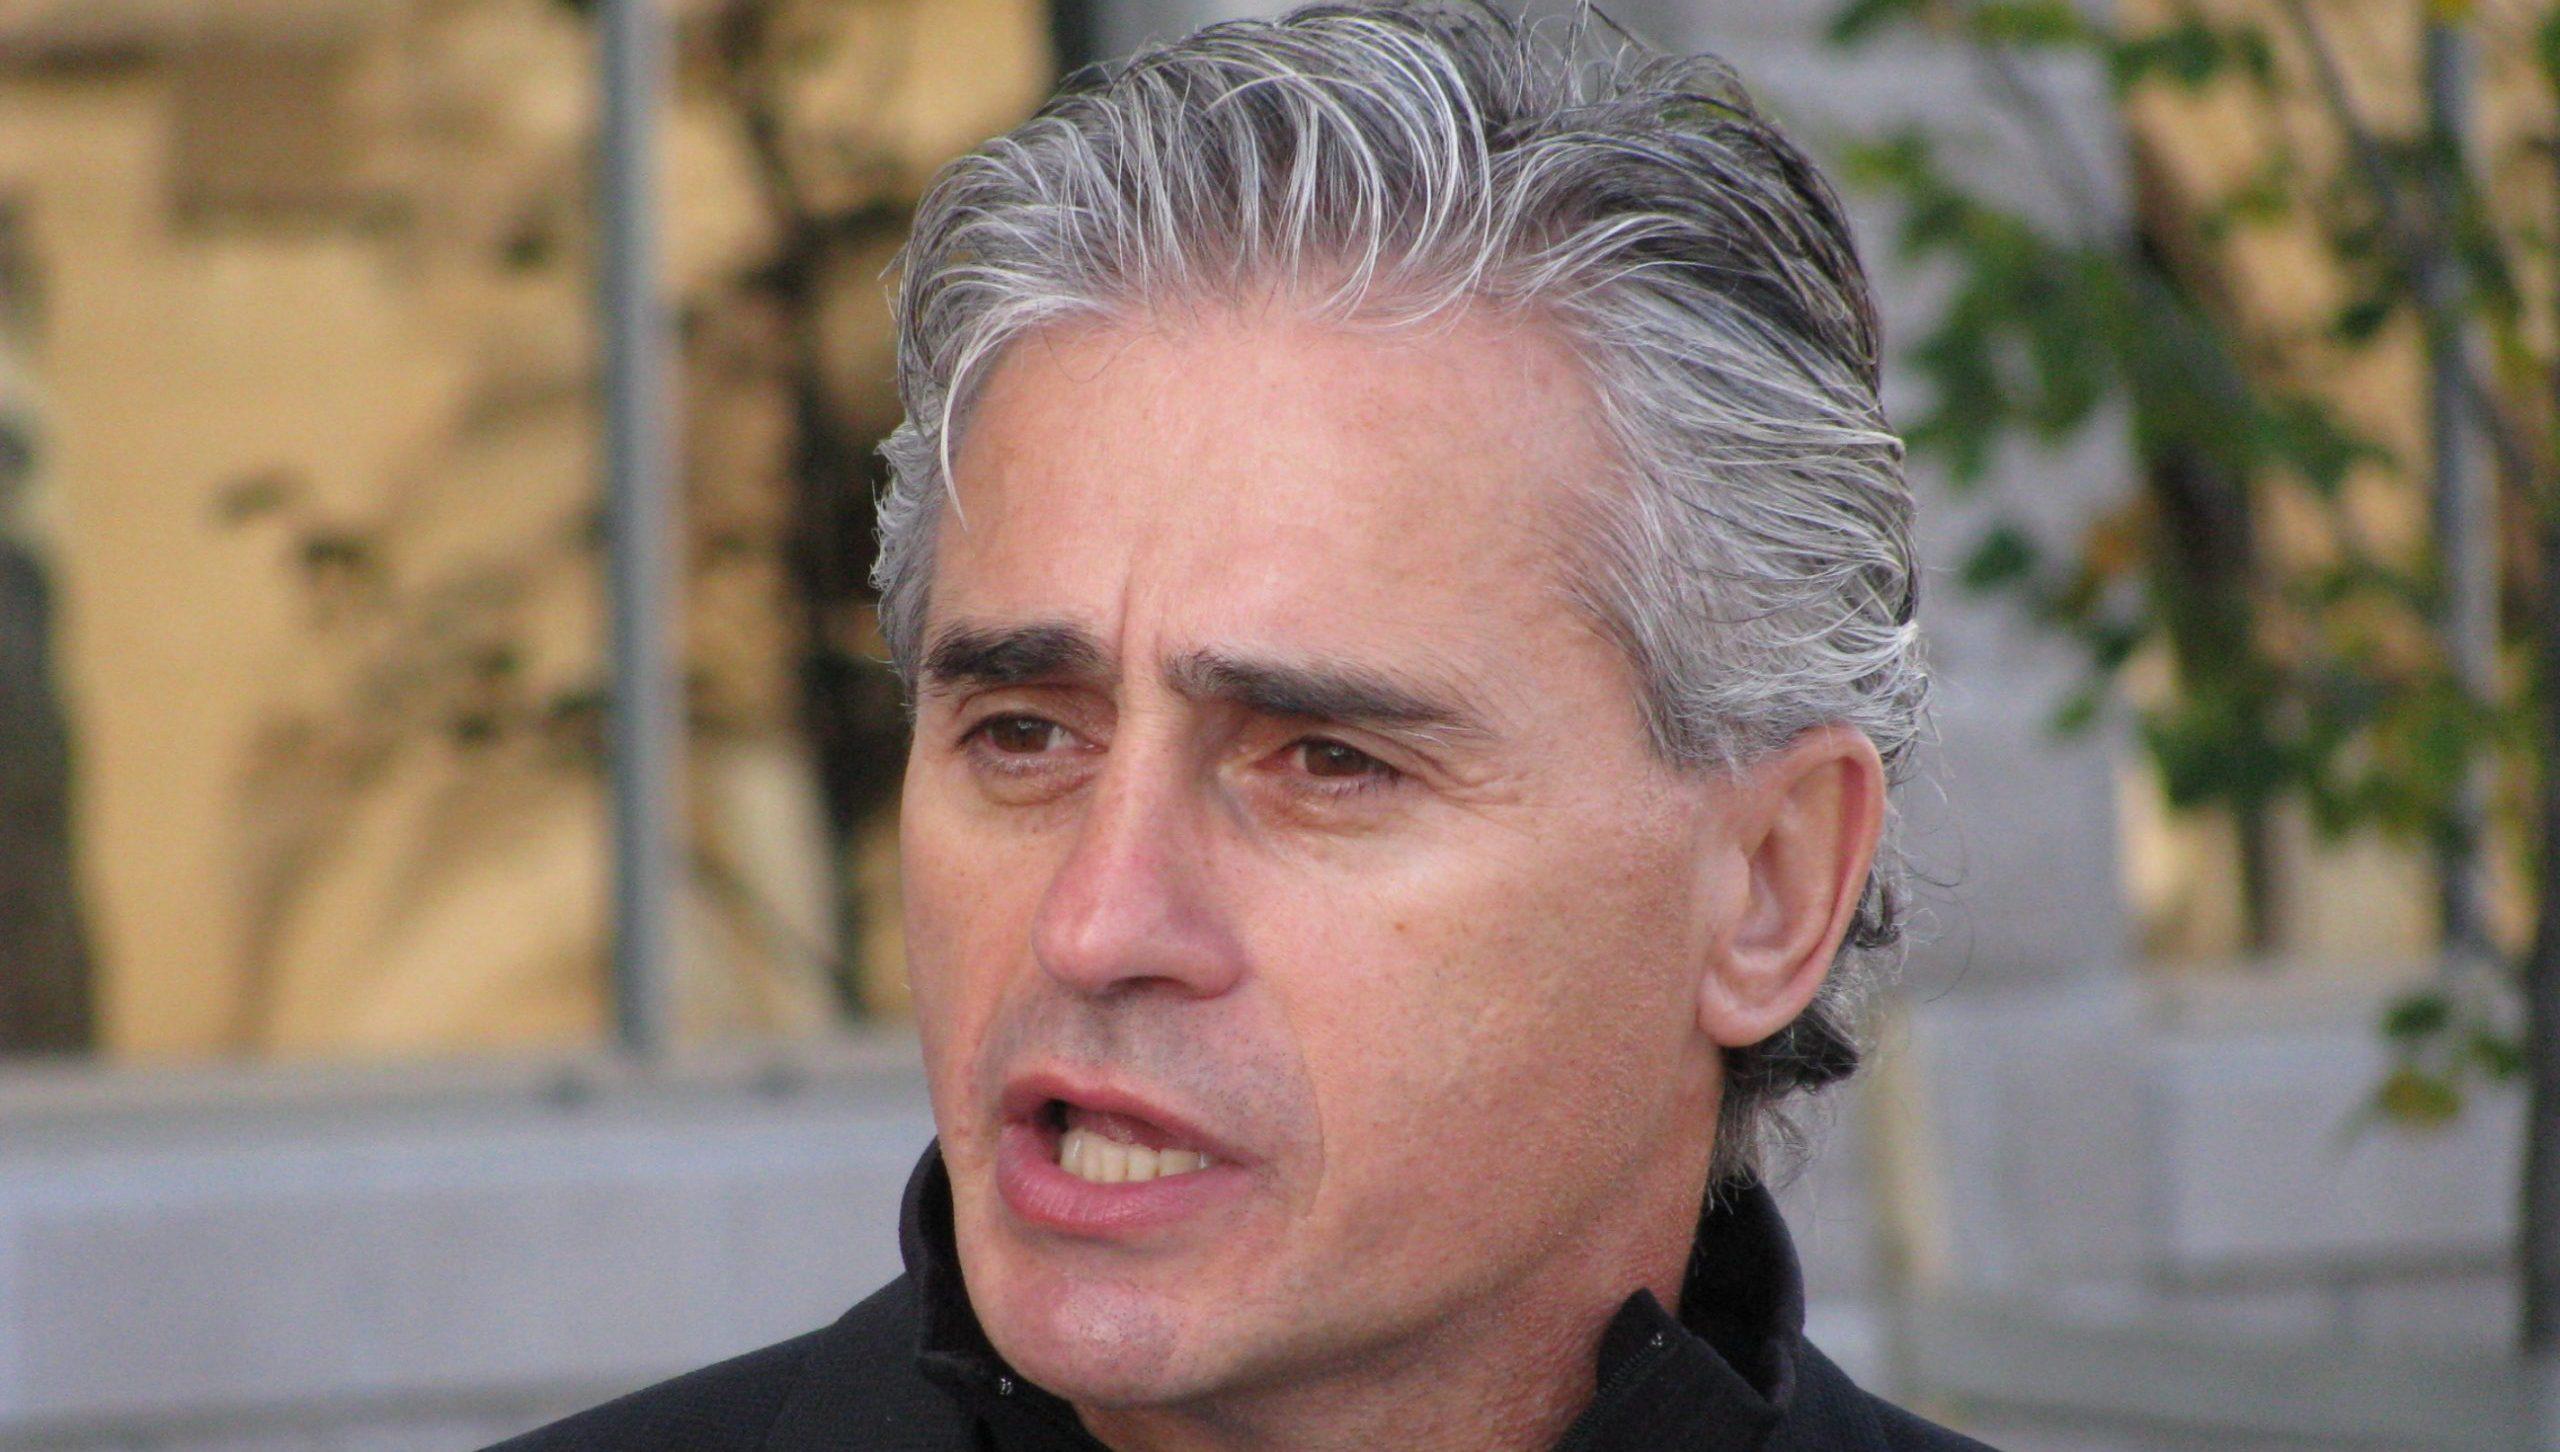 Mayor Defends City's Reputation